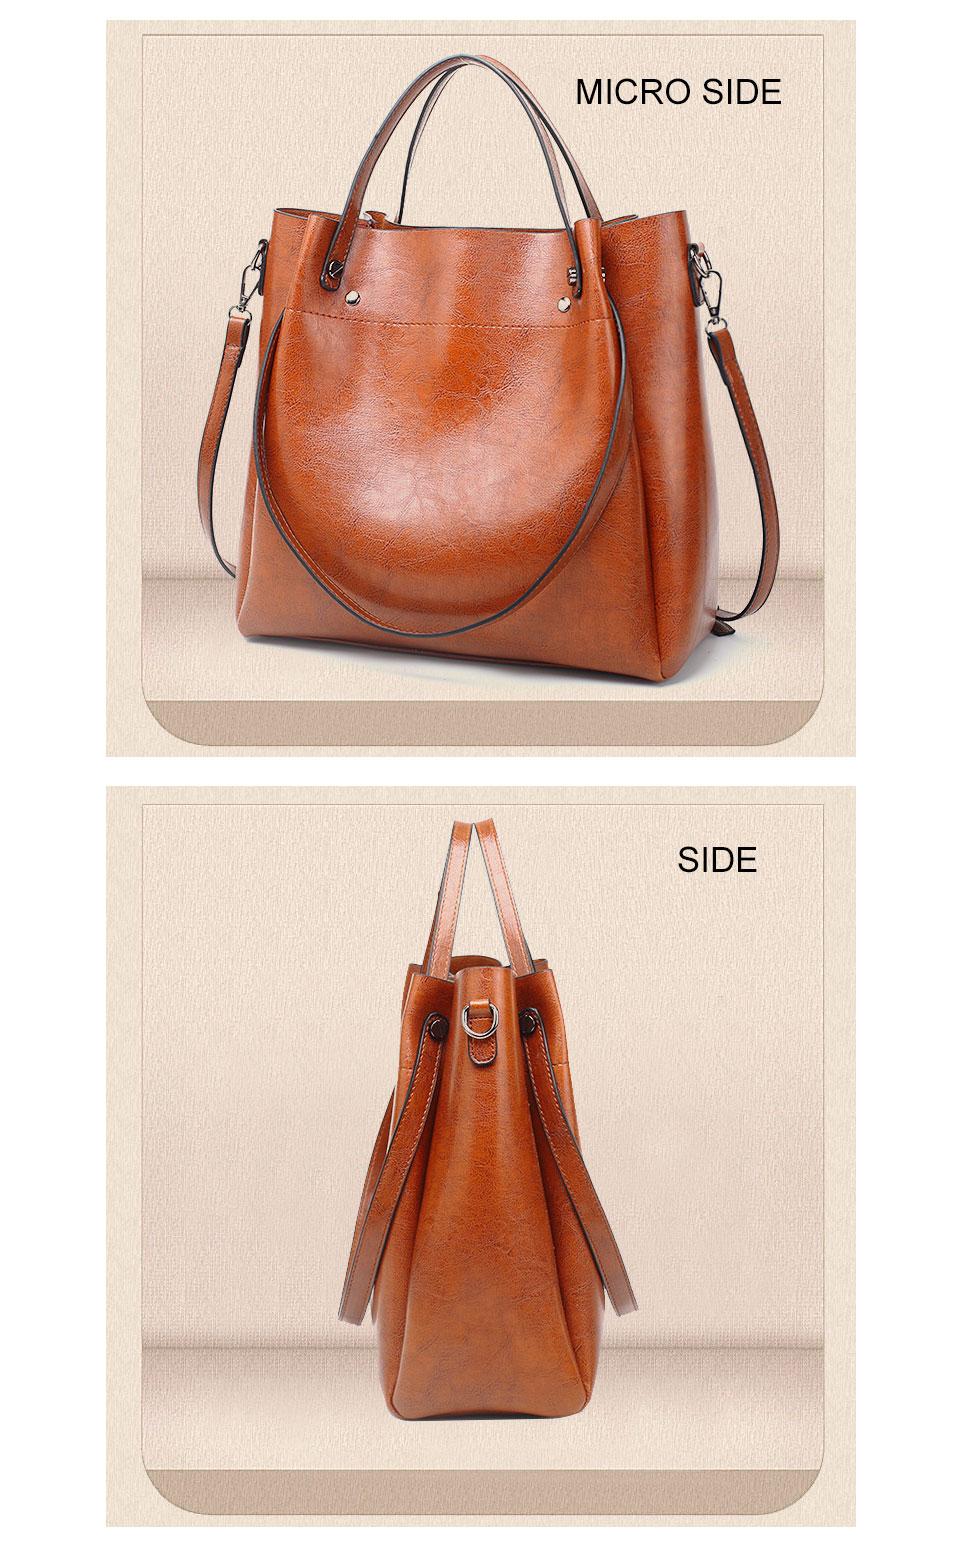 12379680f990 ACELURE Casual Large Capacity Women Tote Shoulder Bag PU Leather Ladies  Bucket Handbag Messenger Bag Soft Shopping Crossbody #34456